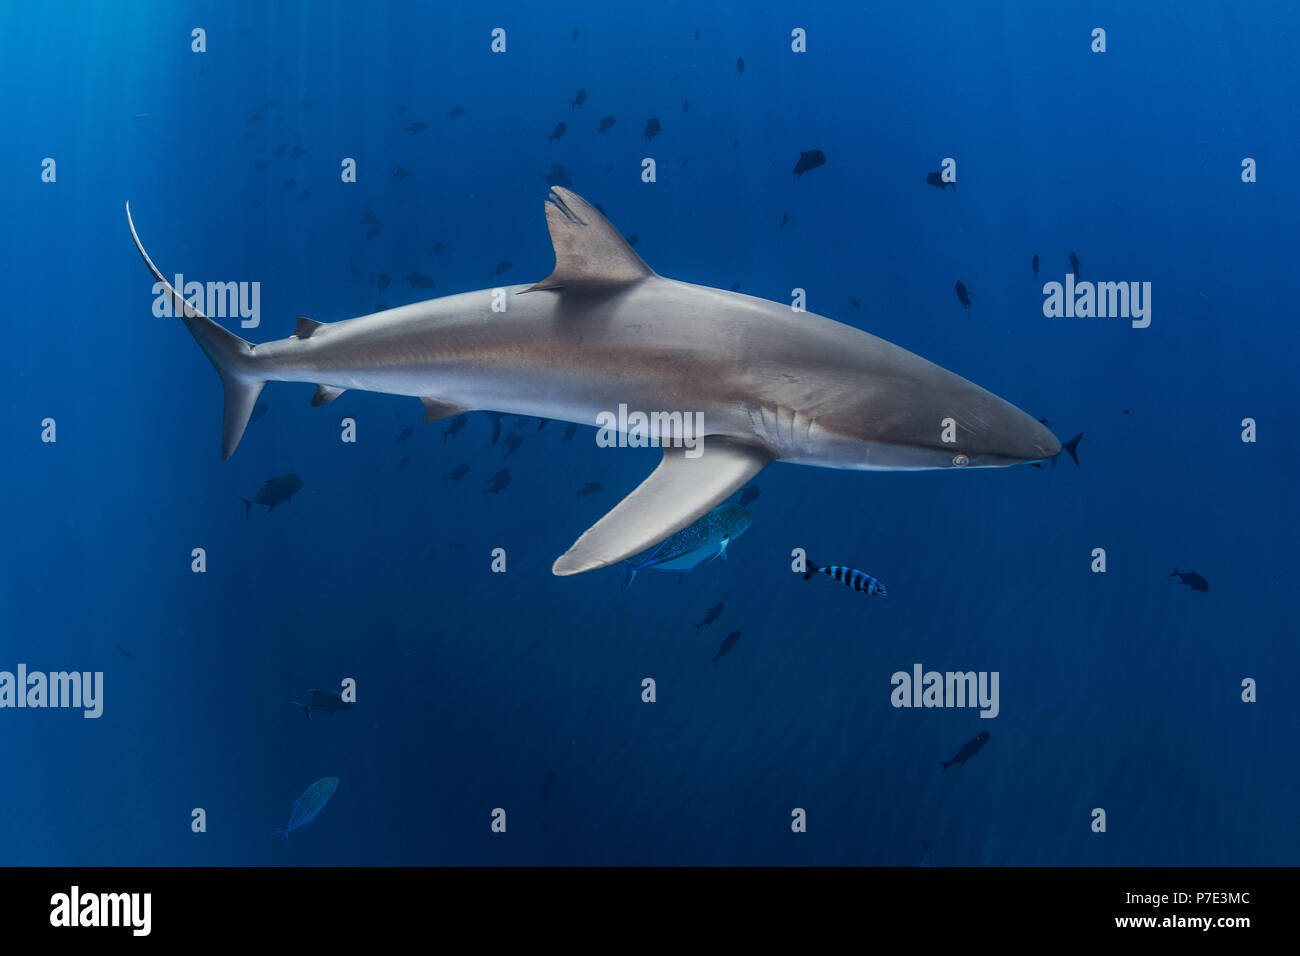 Silky shark in blue water, Revillagigedo, Tamaulipas, Mexico - Stock Image